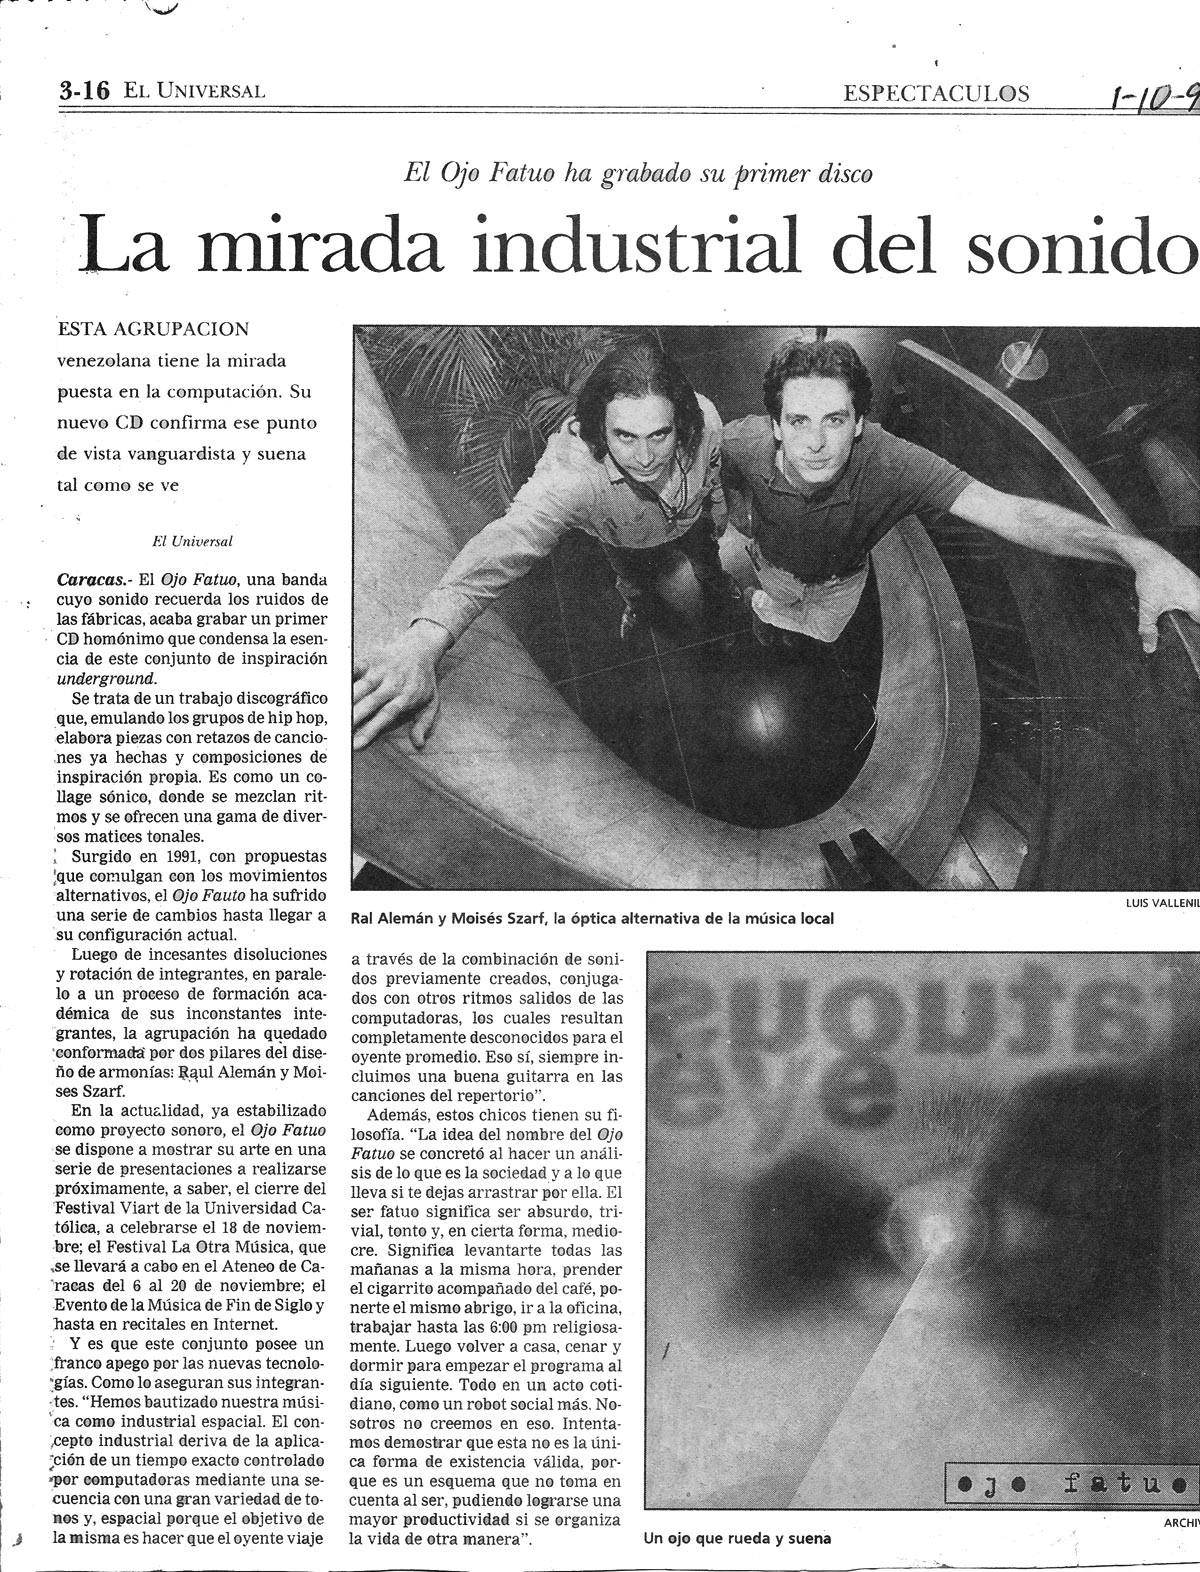 El Universal Newspaper Article Interview